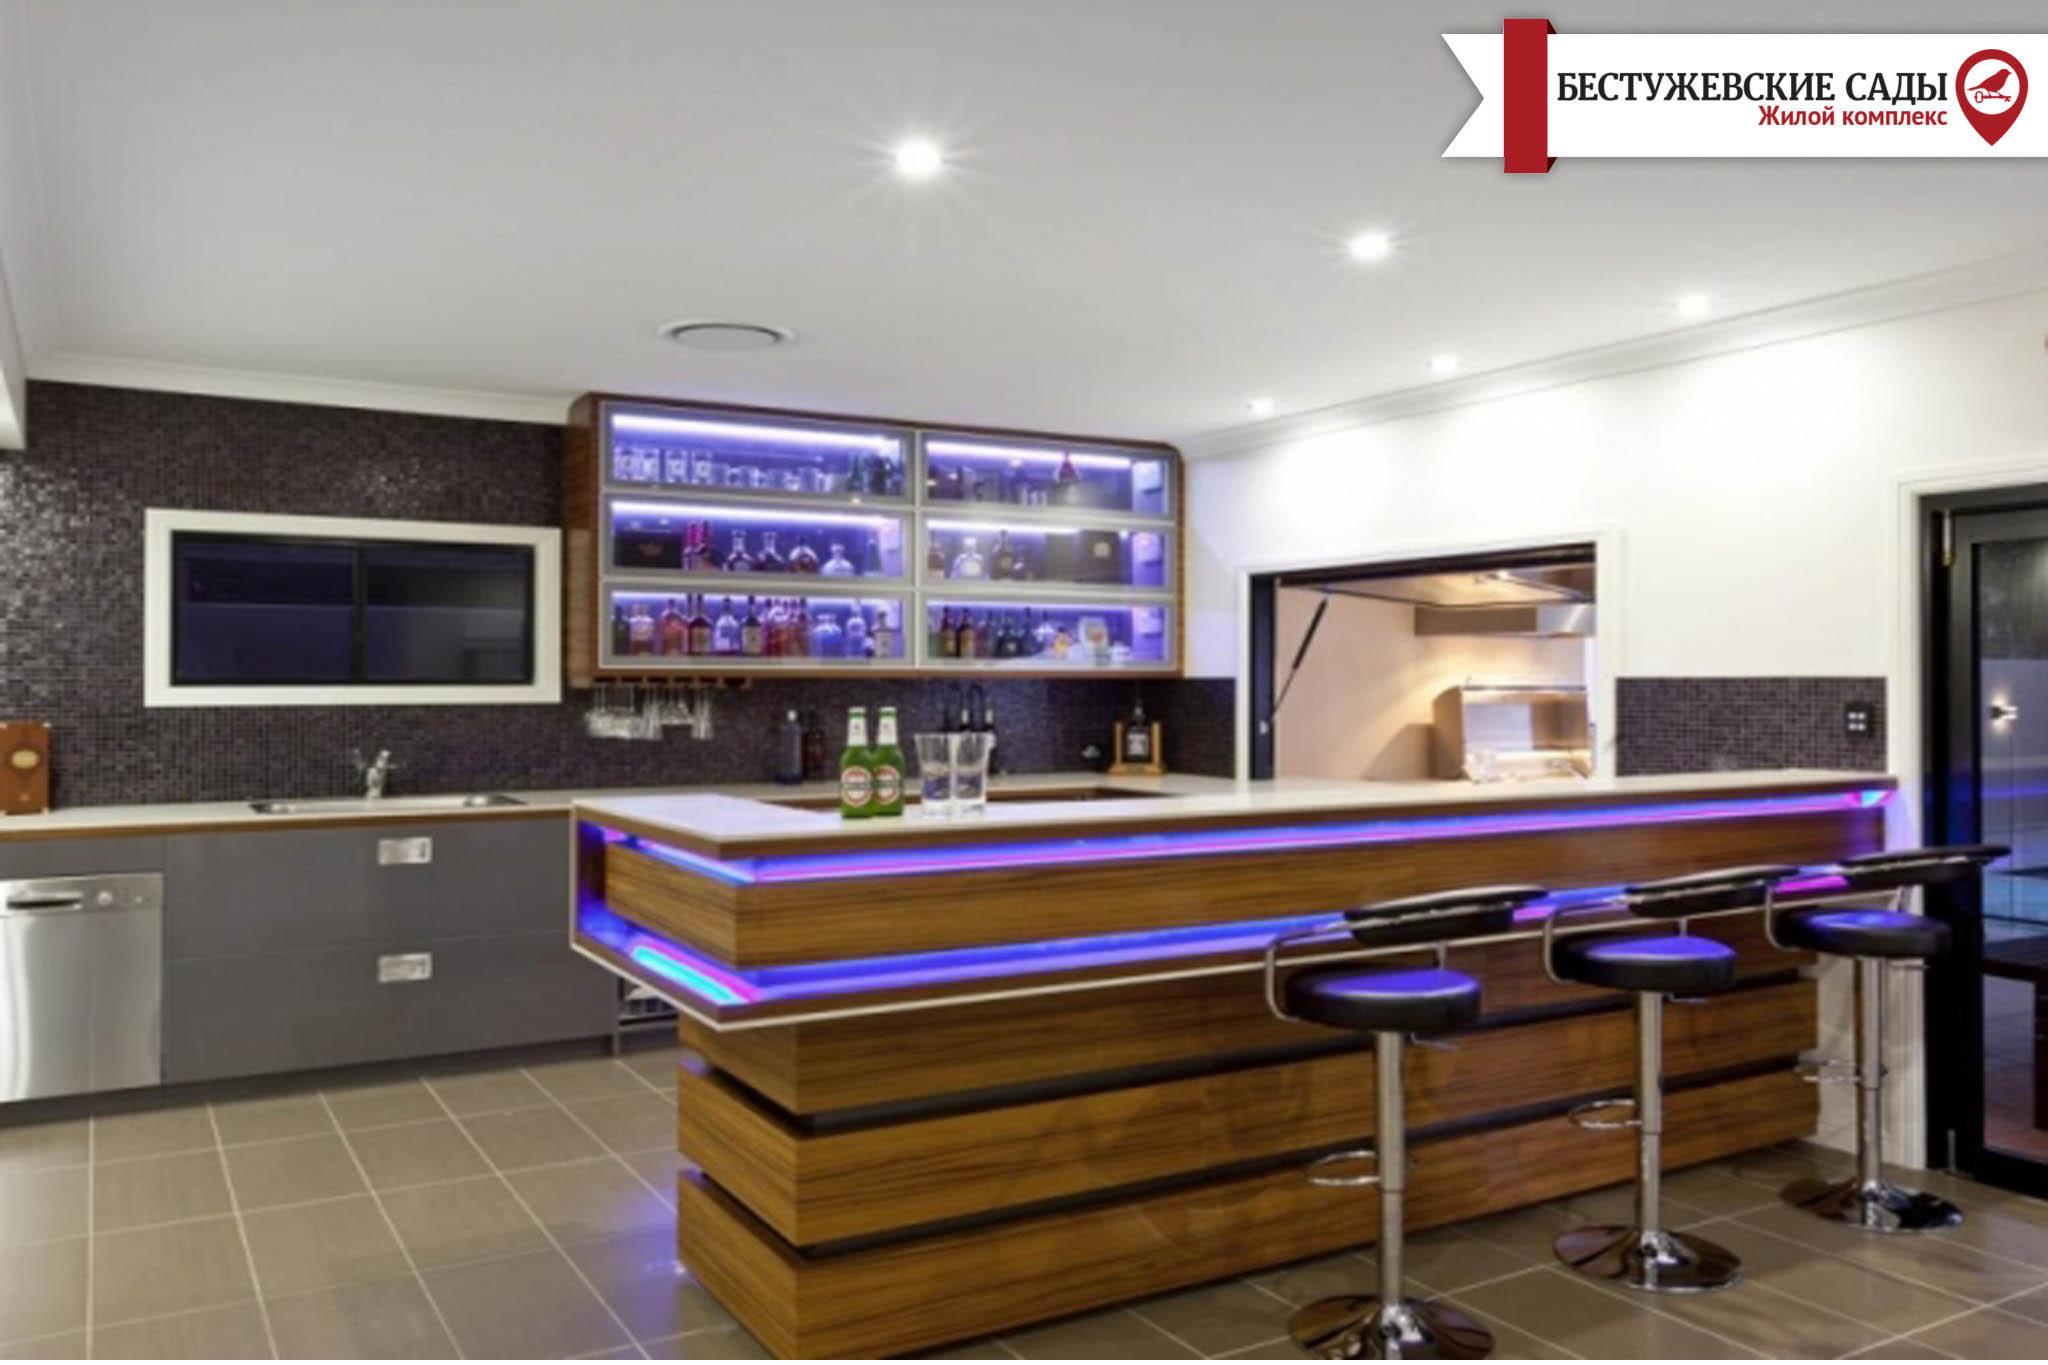 Удобен ли интерьер кухни с барной стойкой?